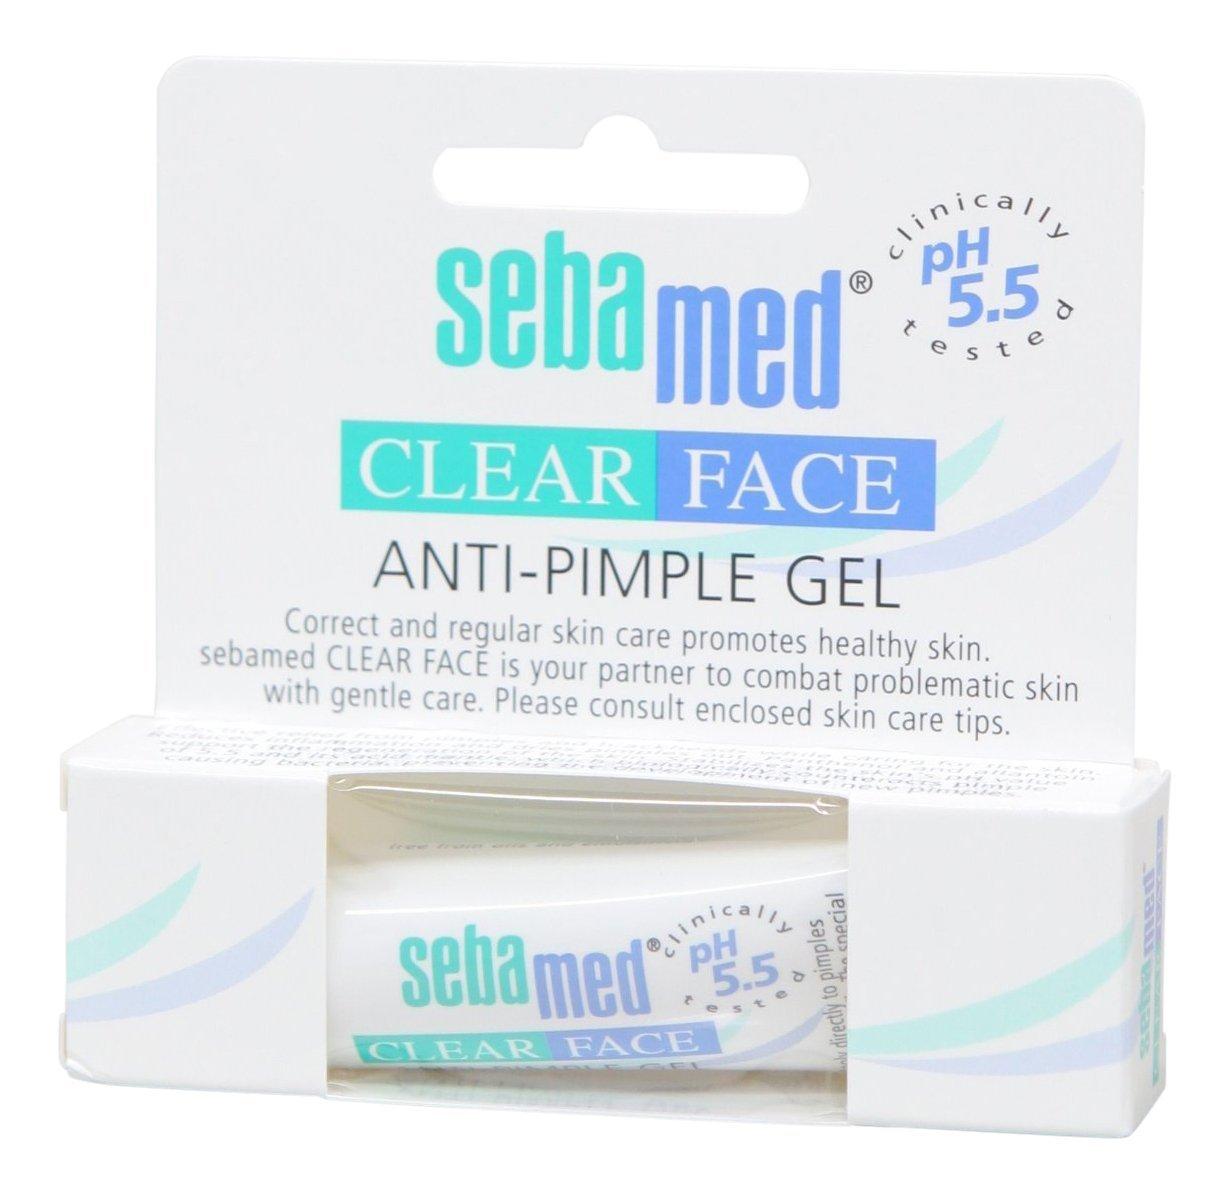 Sebamed Clear Face Anti-Pimple Gel, 10ml (2 Pack)